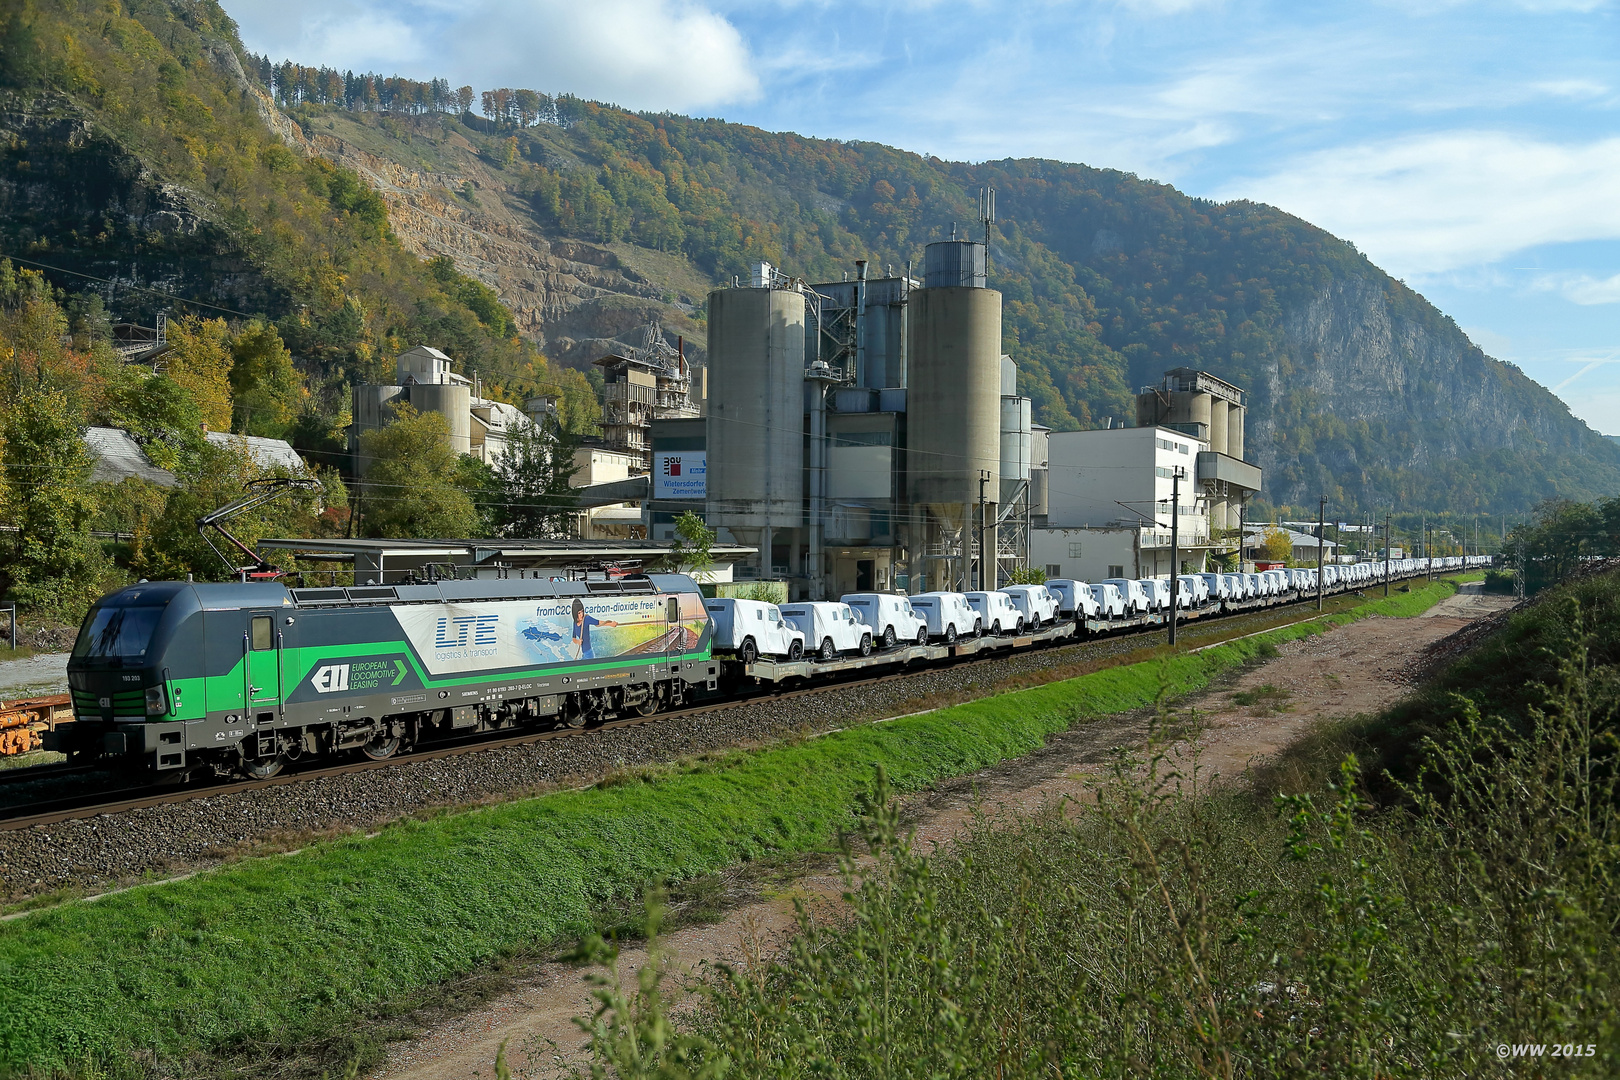 LTE G-Klasse Zug